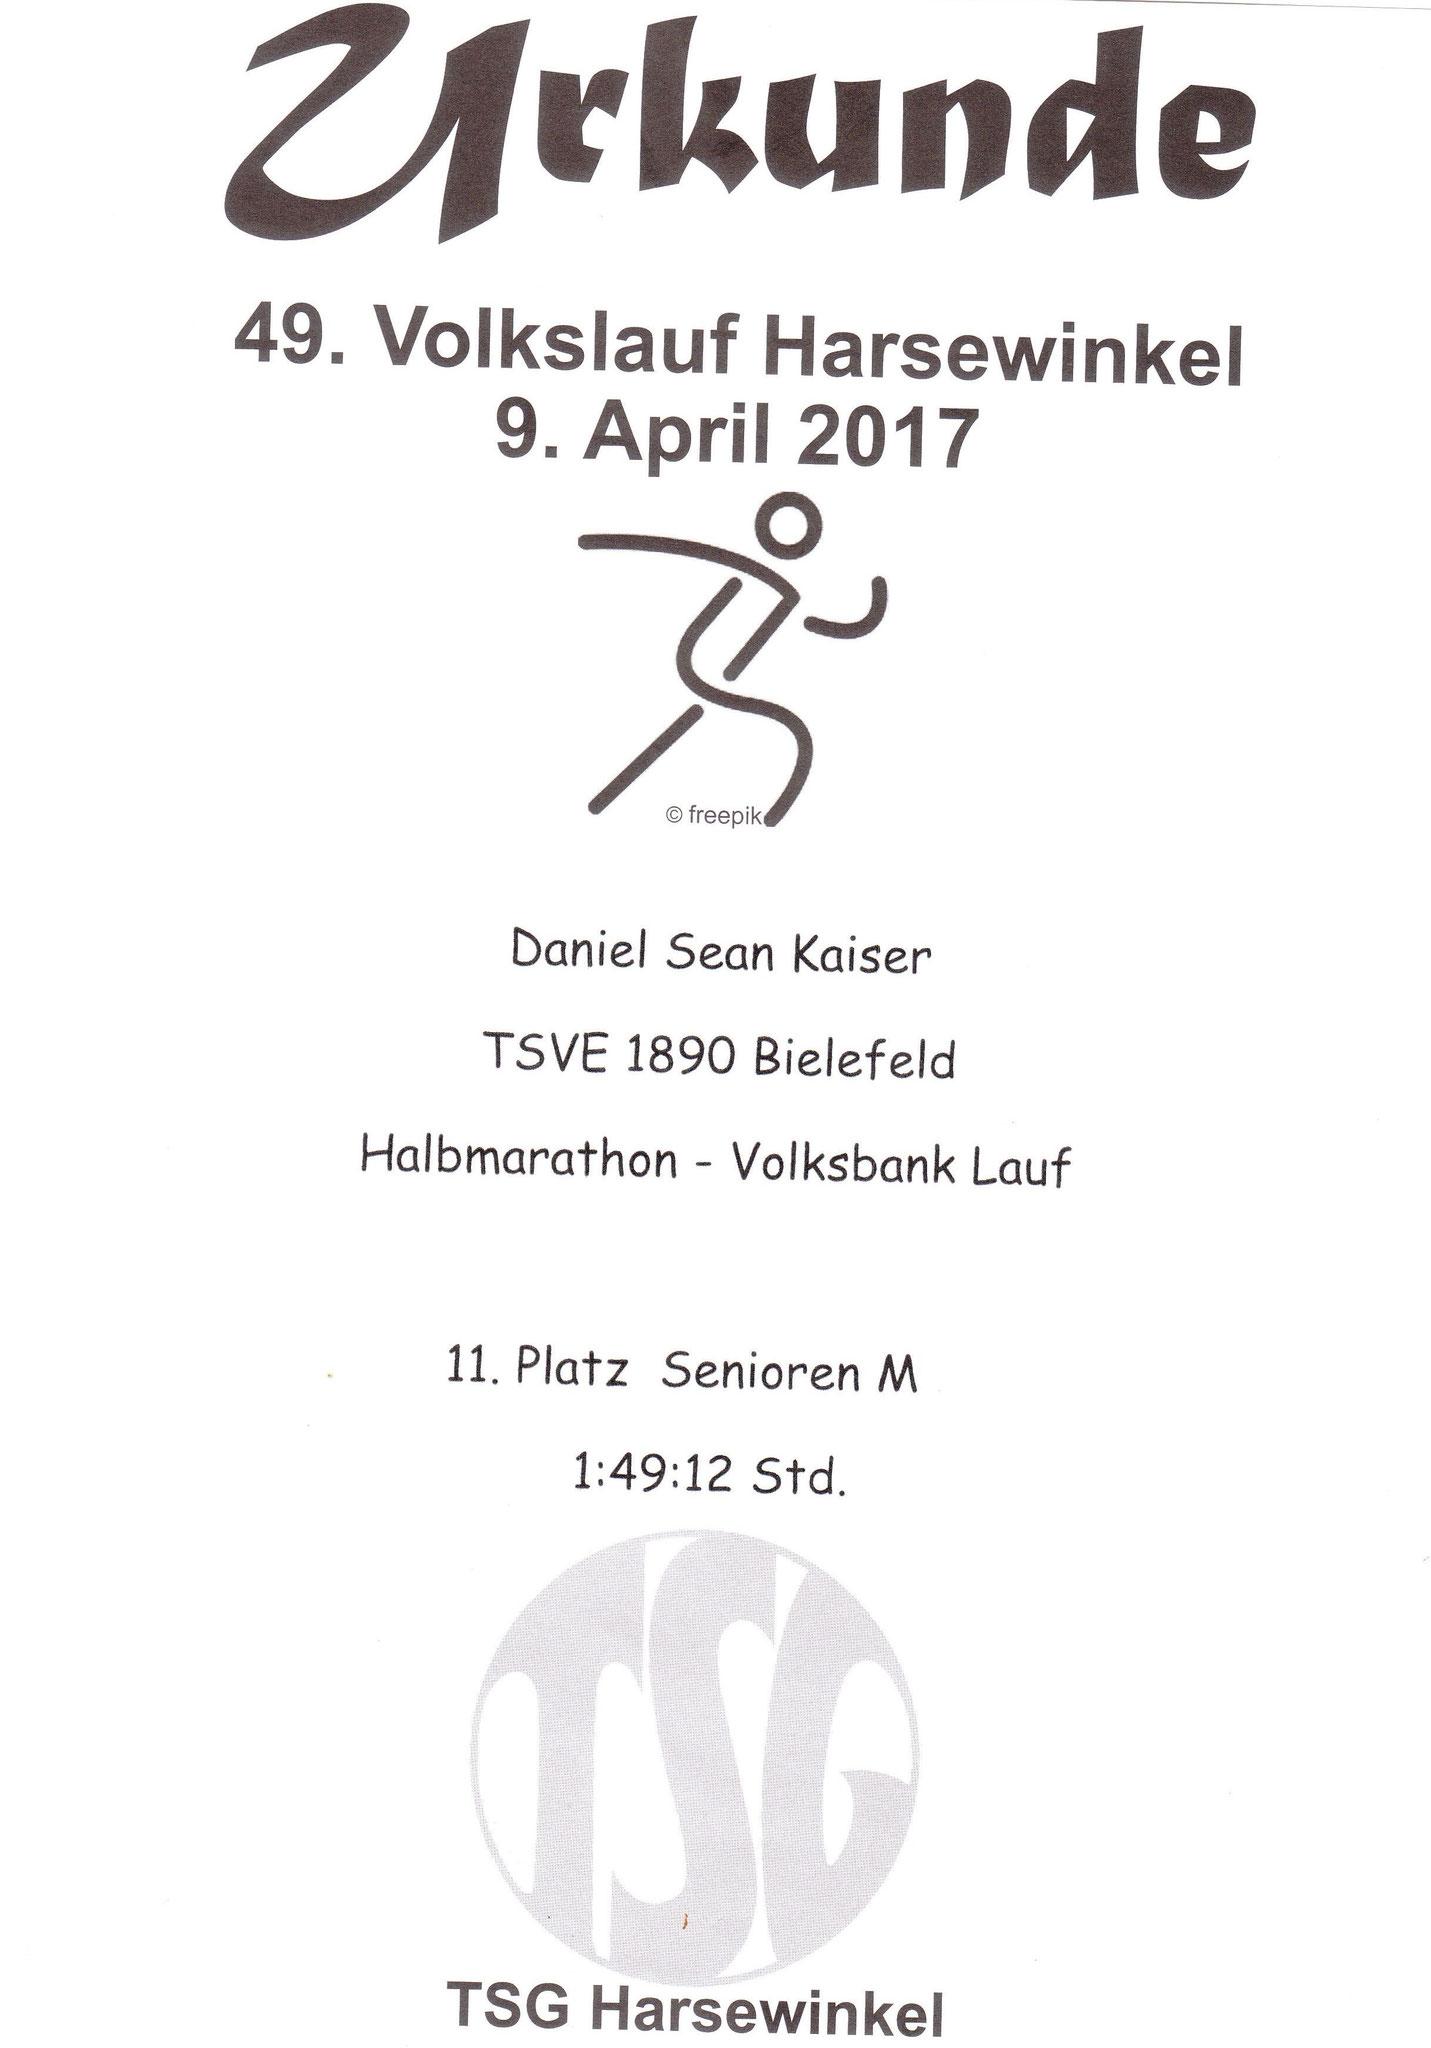 Volkslauf Harsewinkel (Halbmarathon) 2017 - Urkunde